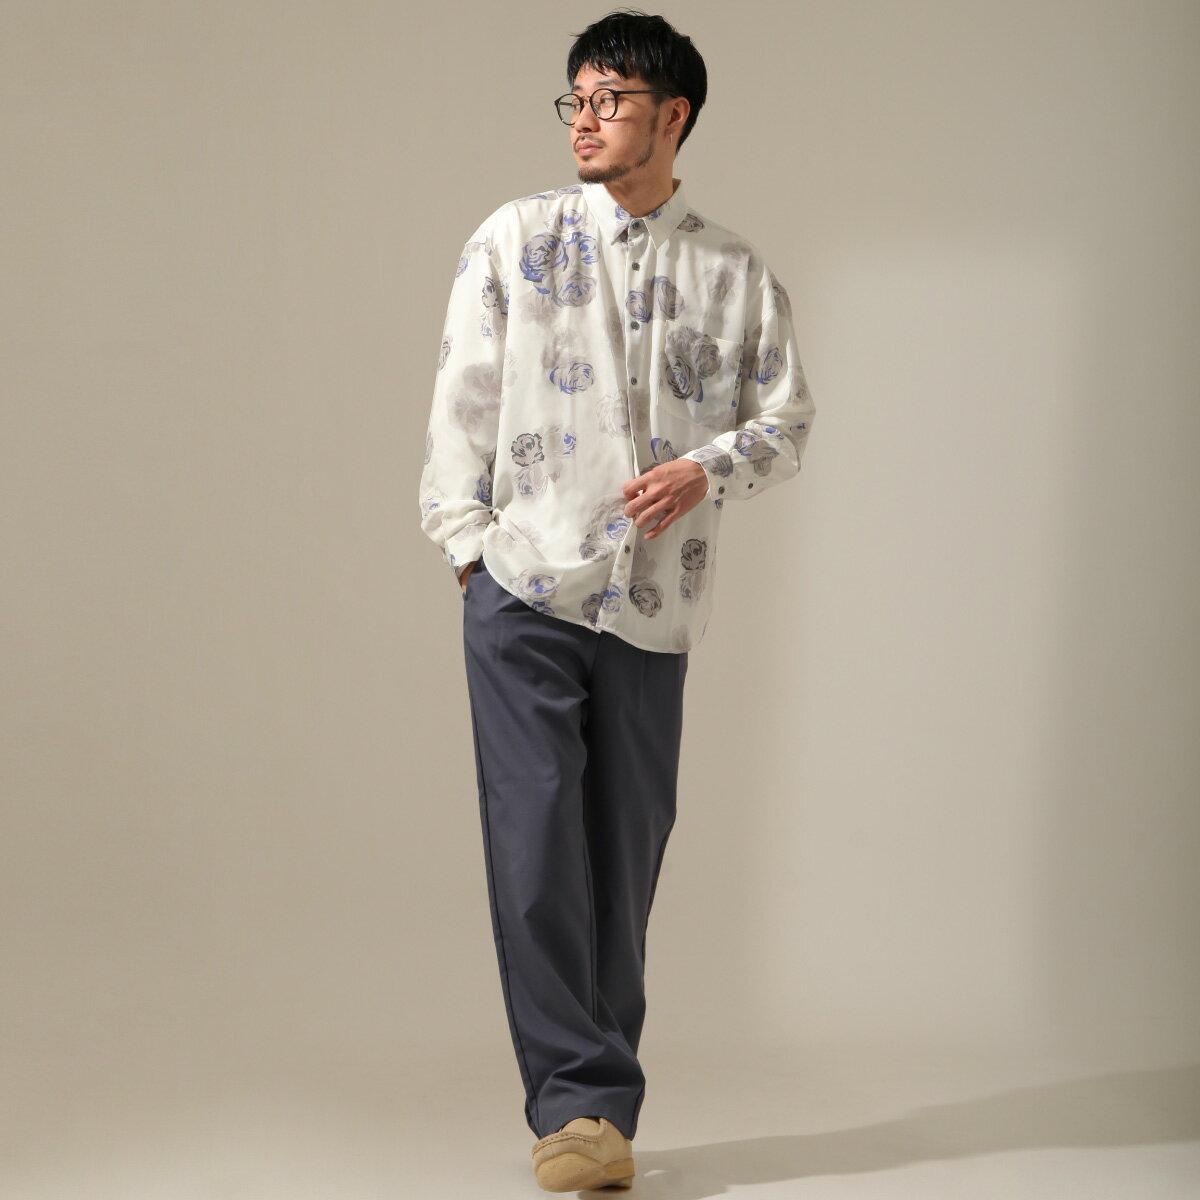 【New】ZIP 寬版長袖襯衫 花朵設計 5